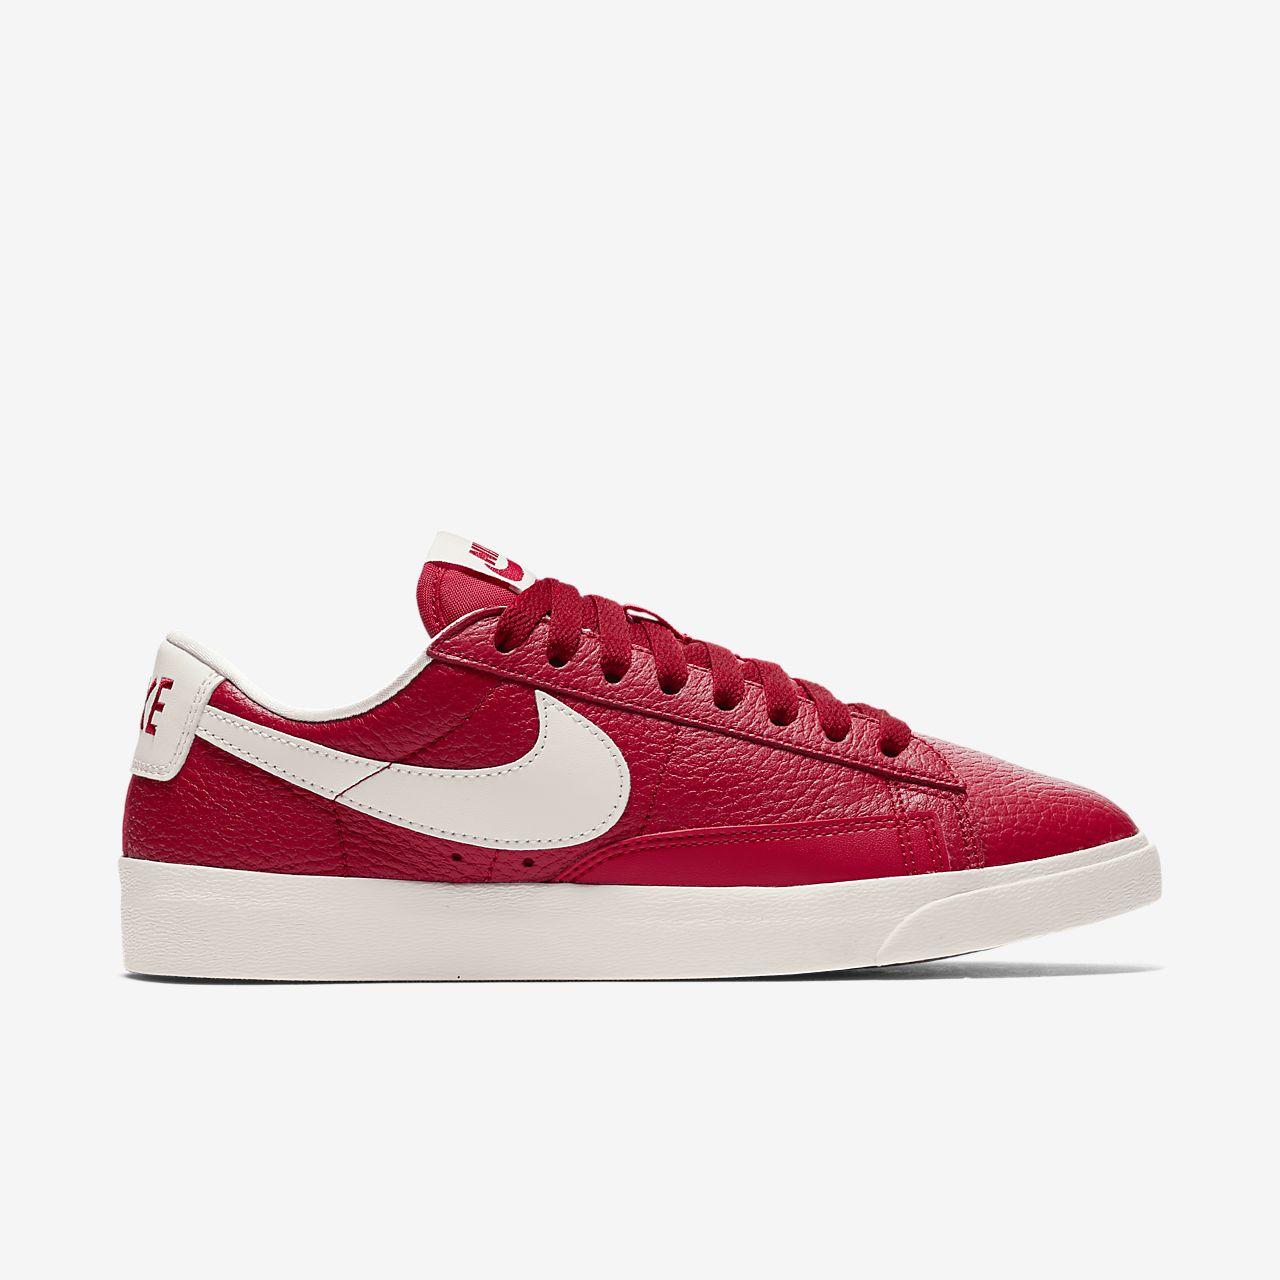 Nike Blazer Premium low 0DjKShtG